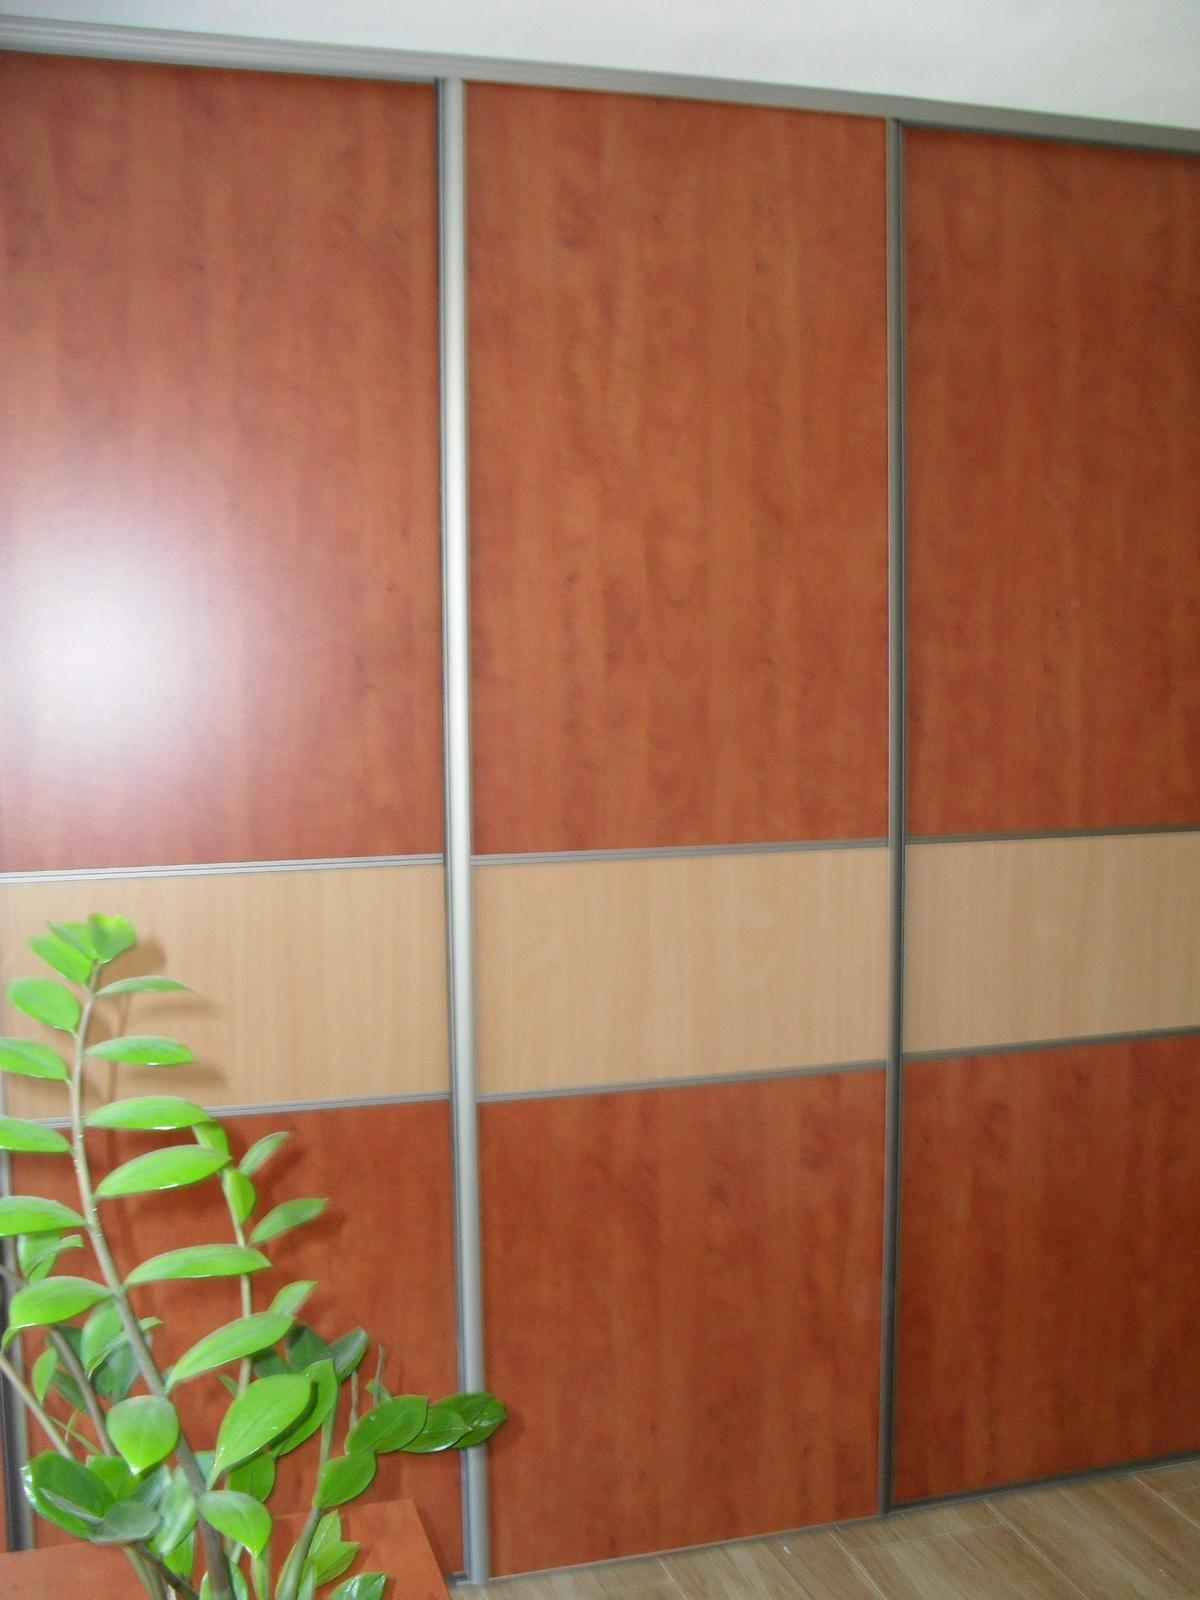 Vstavané skrine Martin Benko Bošany - Obrázok č. 12